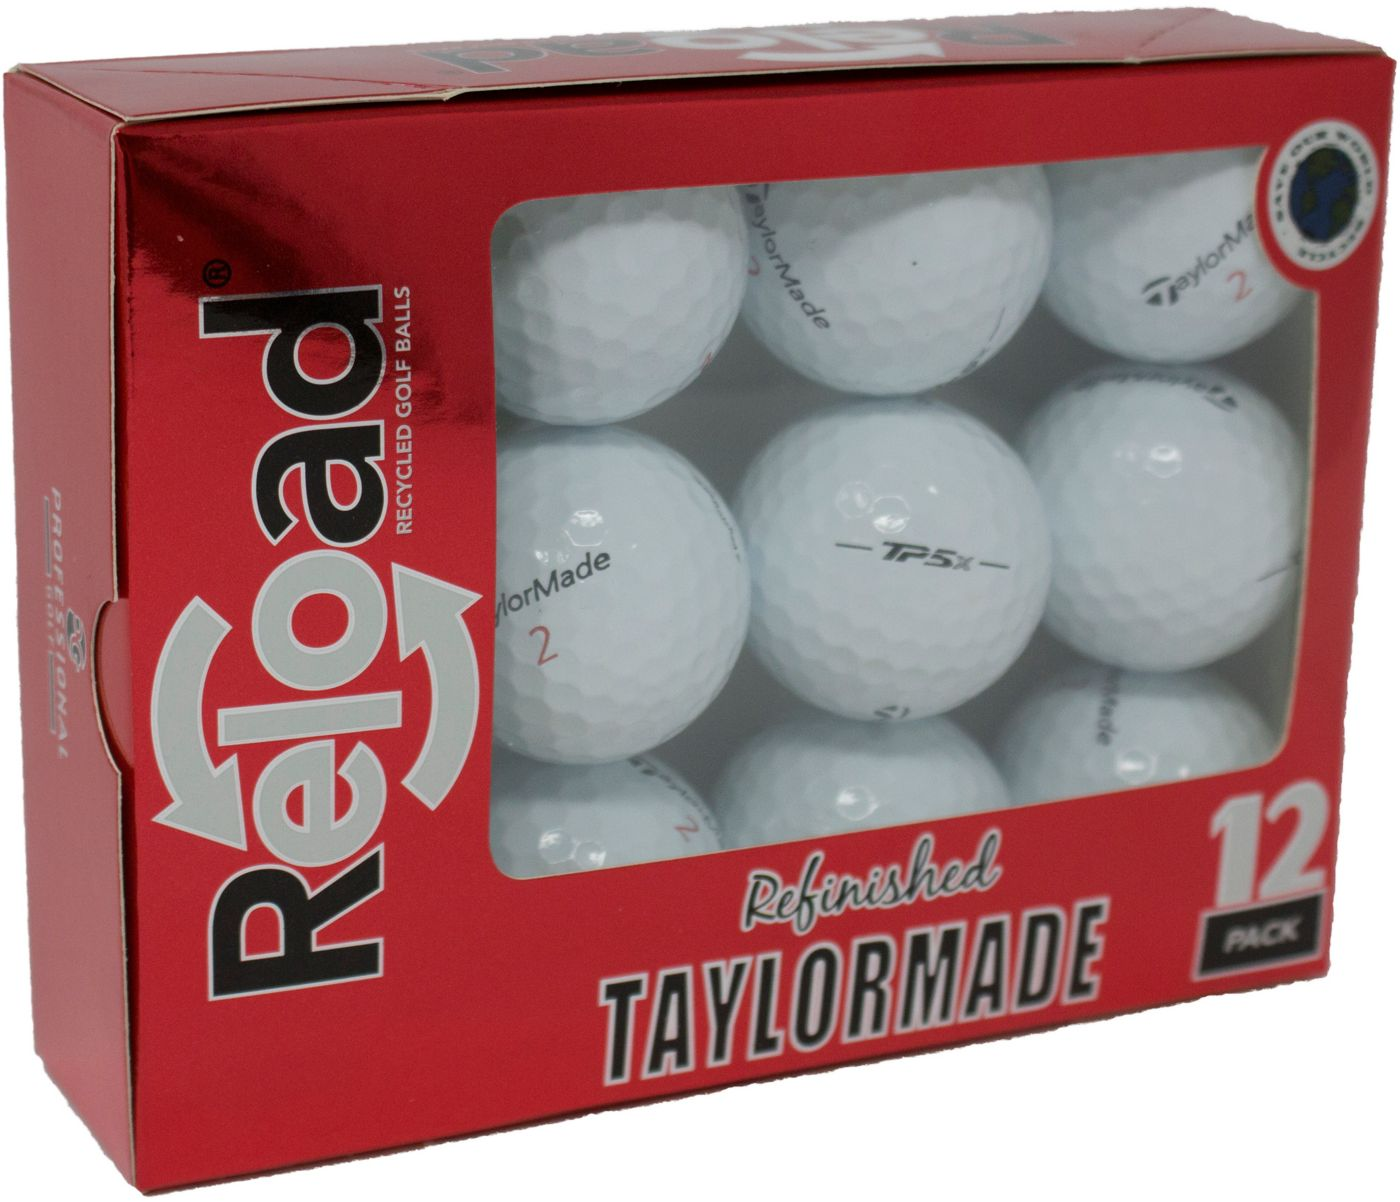 Refurbished TaylorMade TP5x Golf Balls